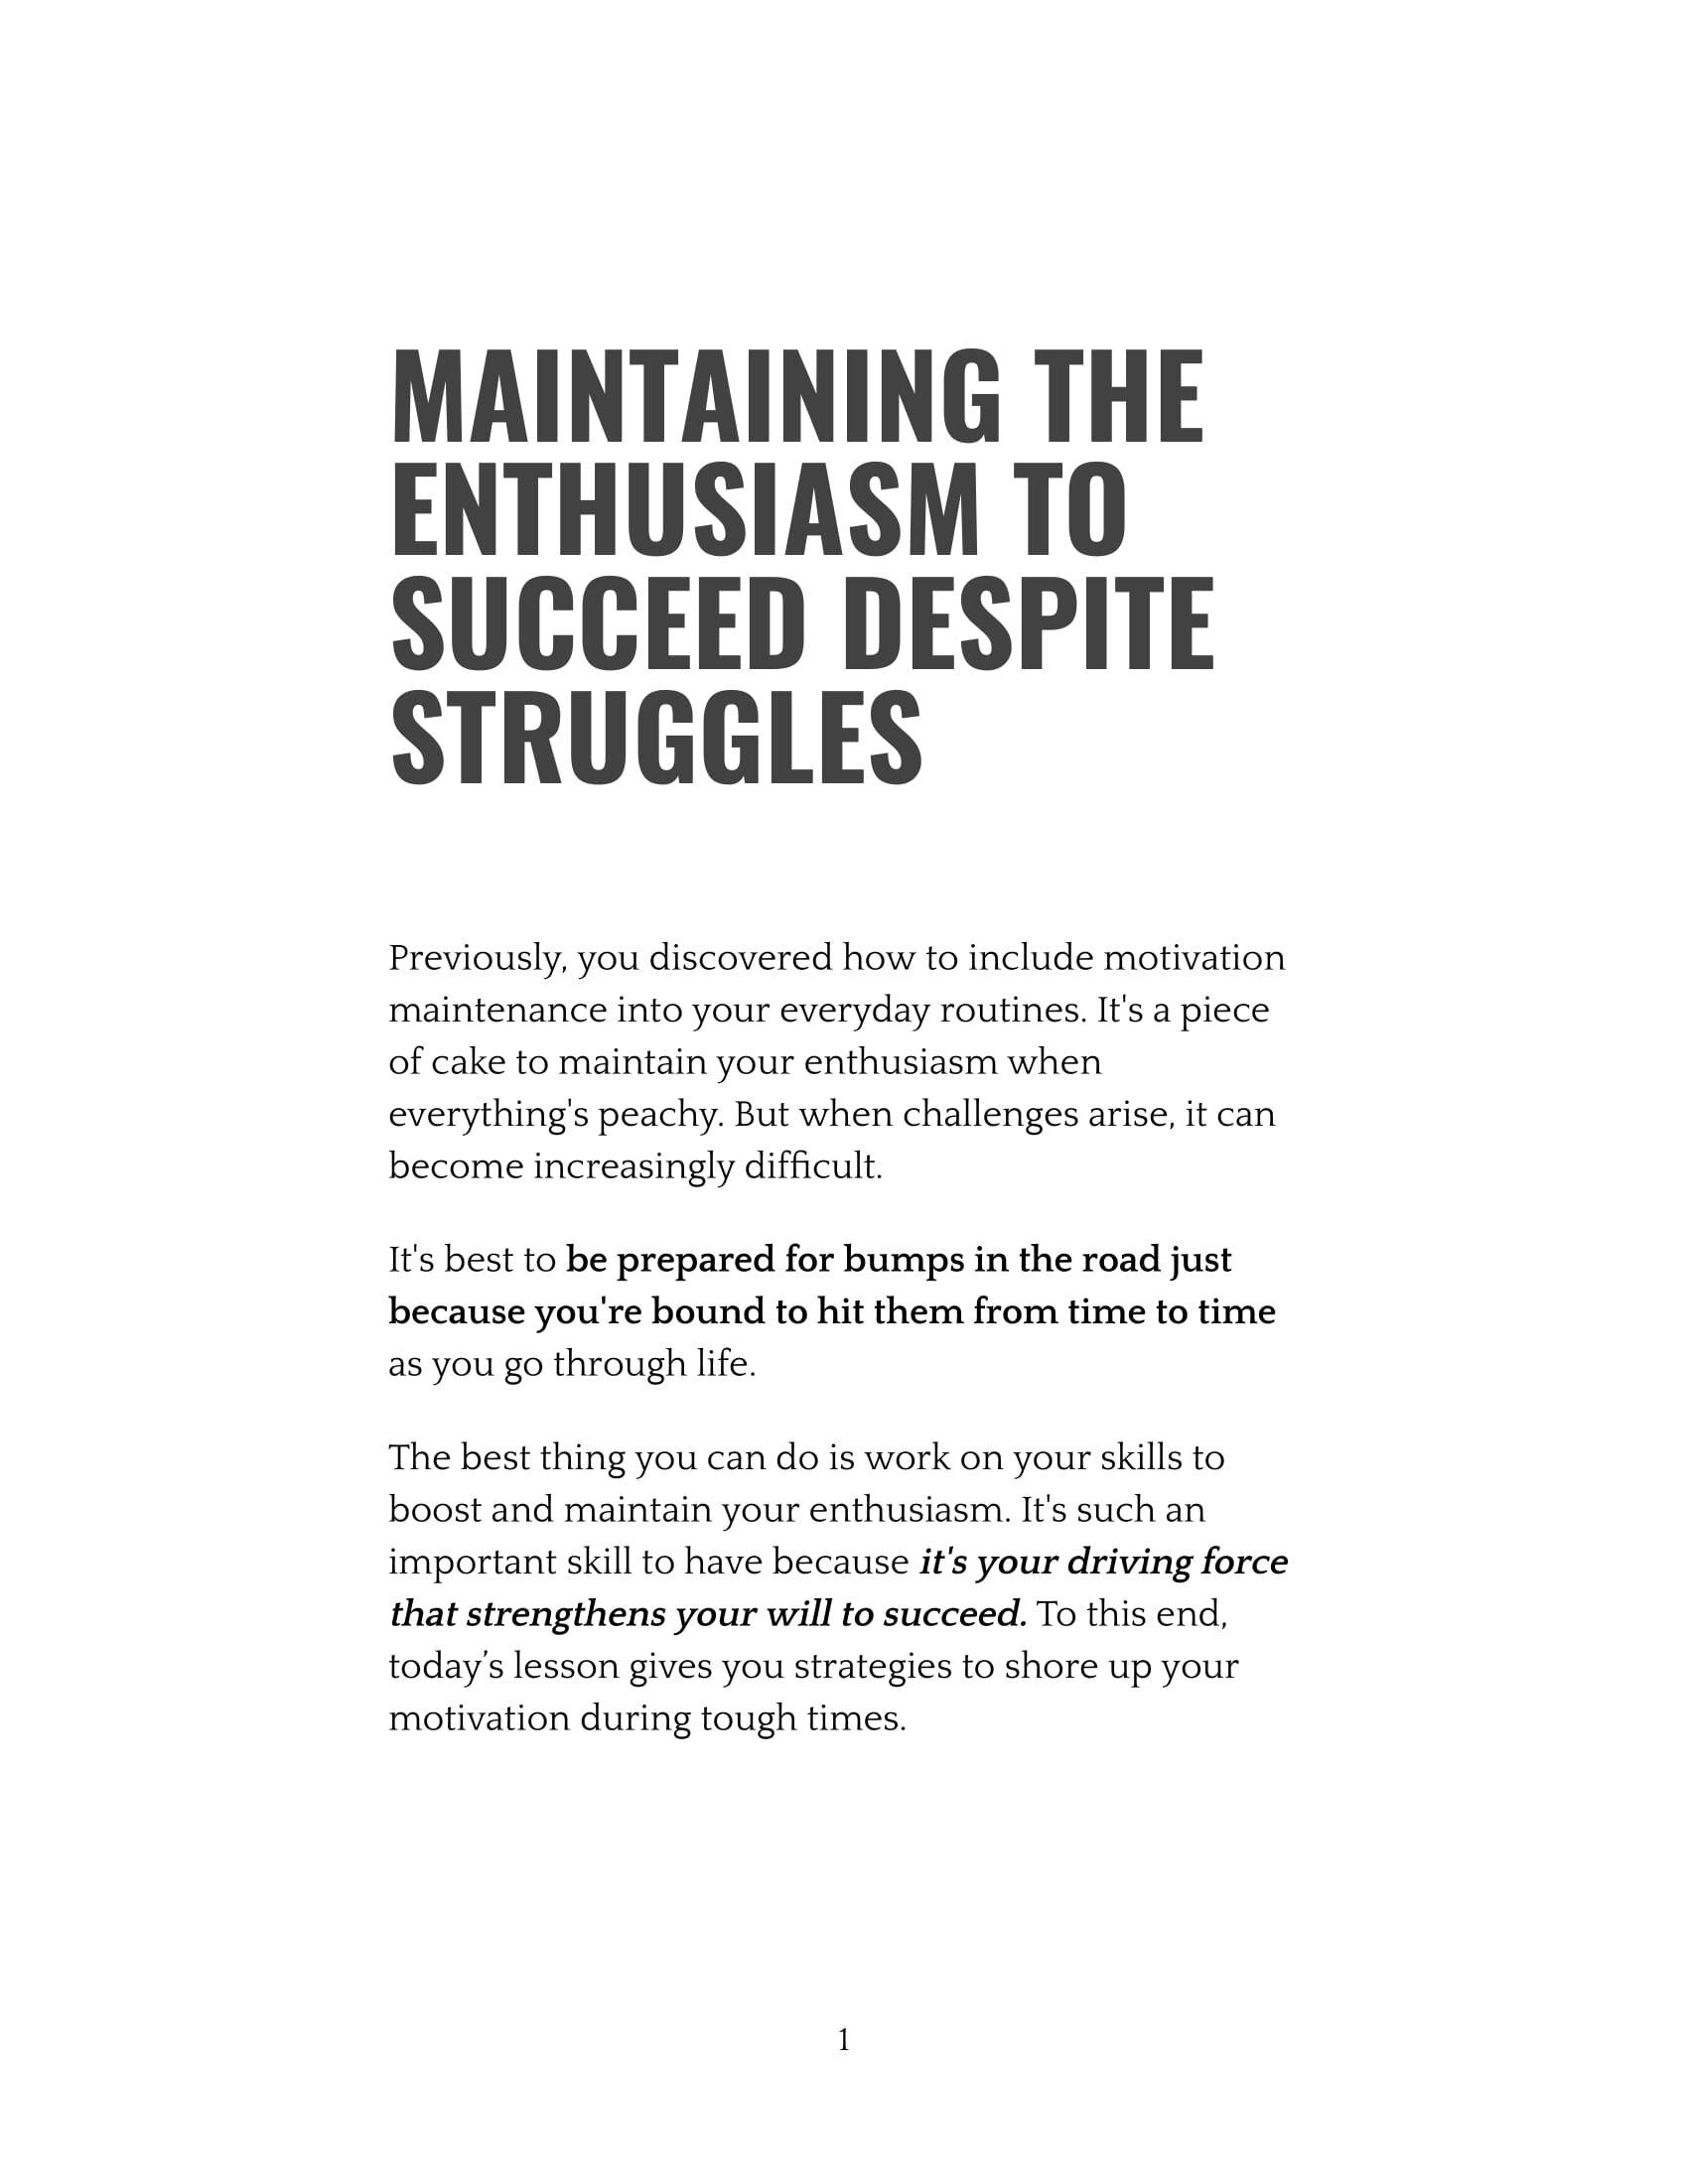 Maintaining The Enthusiasm To Succeed Despite Struggles-1.jpg